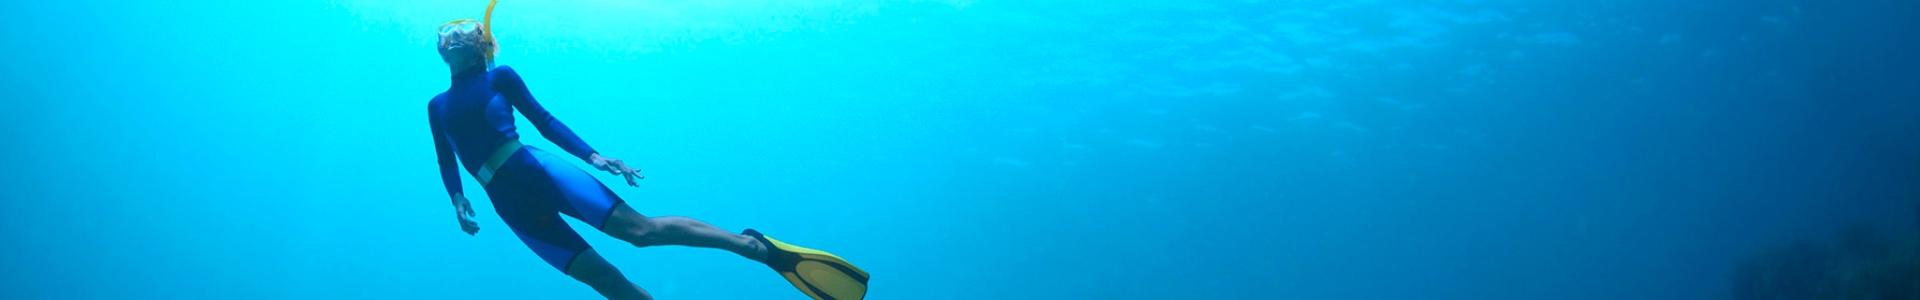 examen medical plongee sous-marine scubadiving